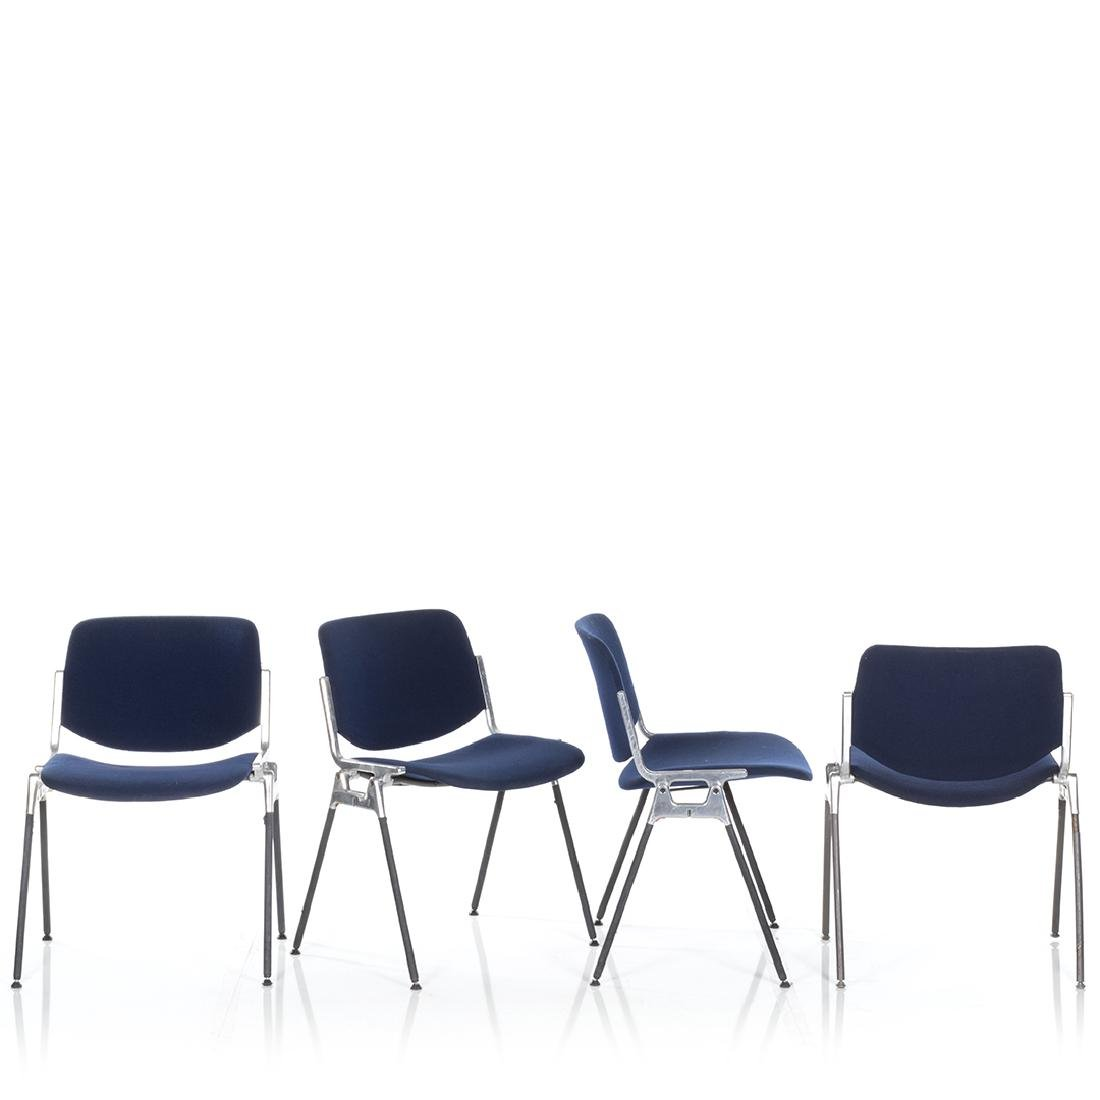 Giancarlo Piretti Chairs (12) - 3